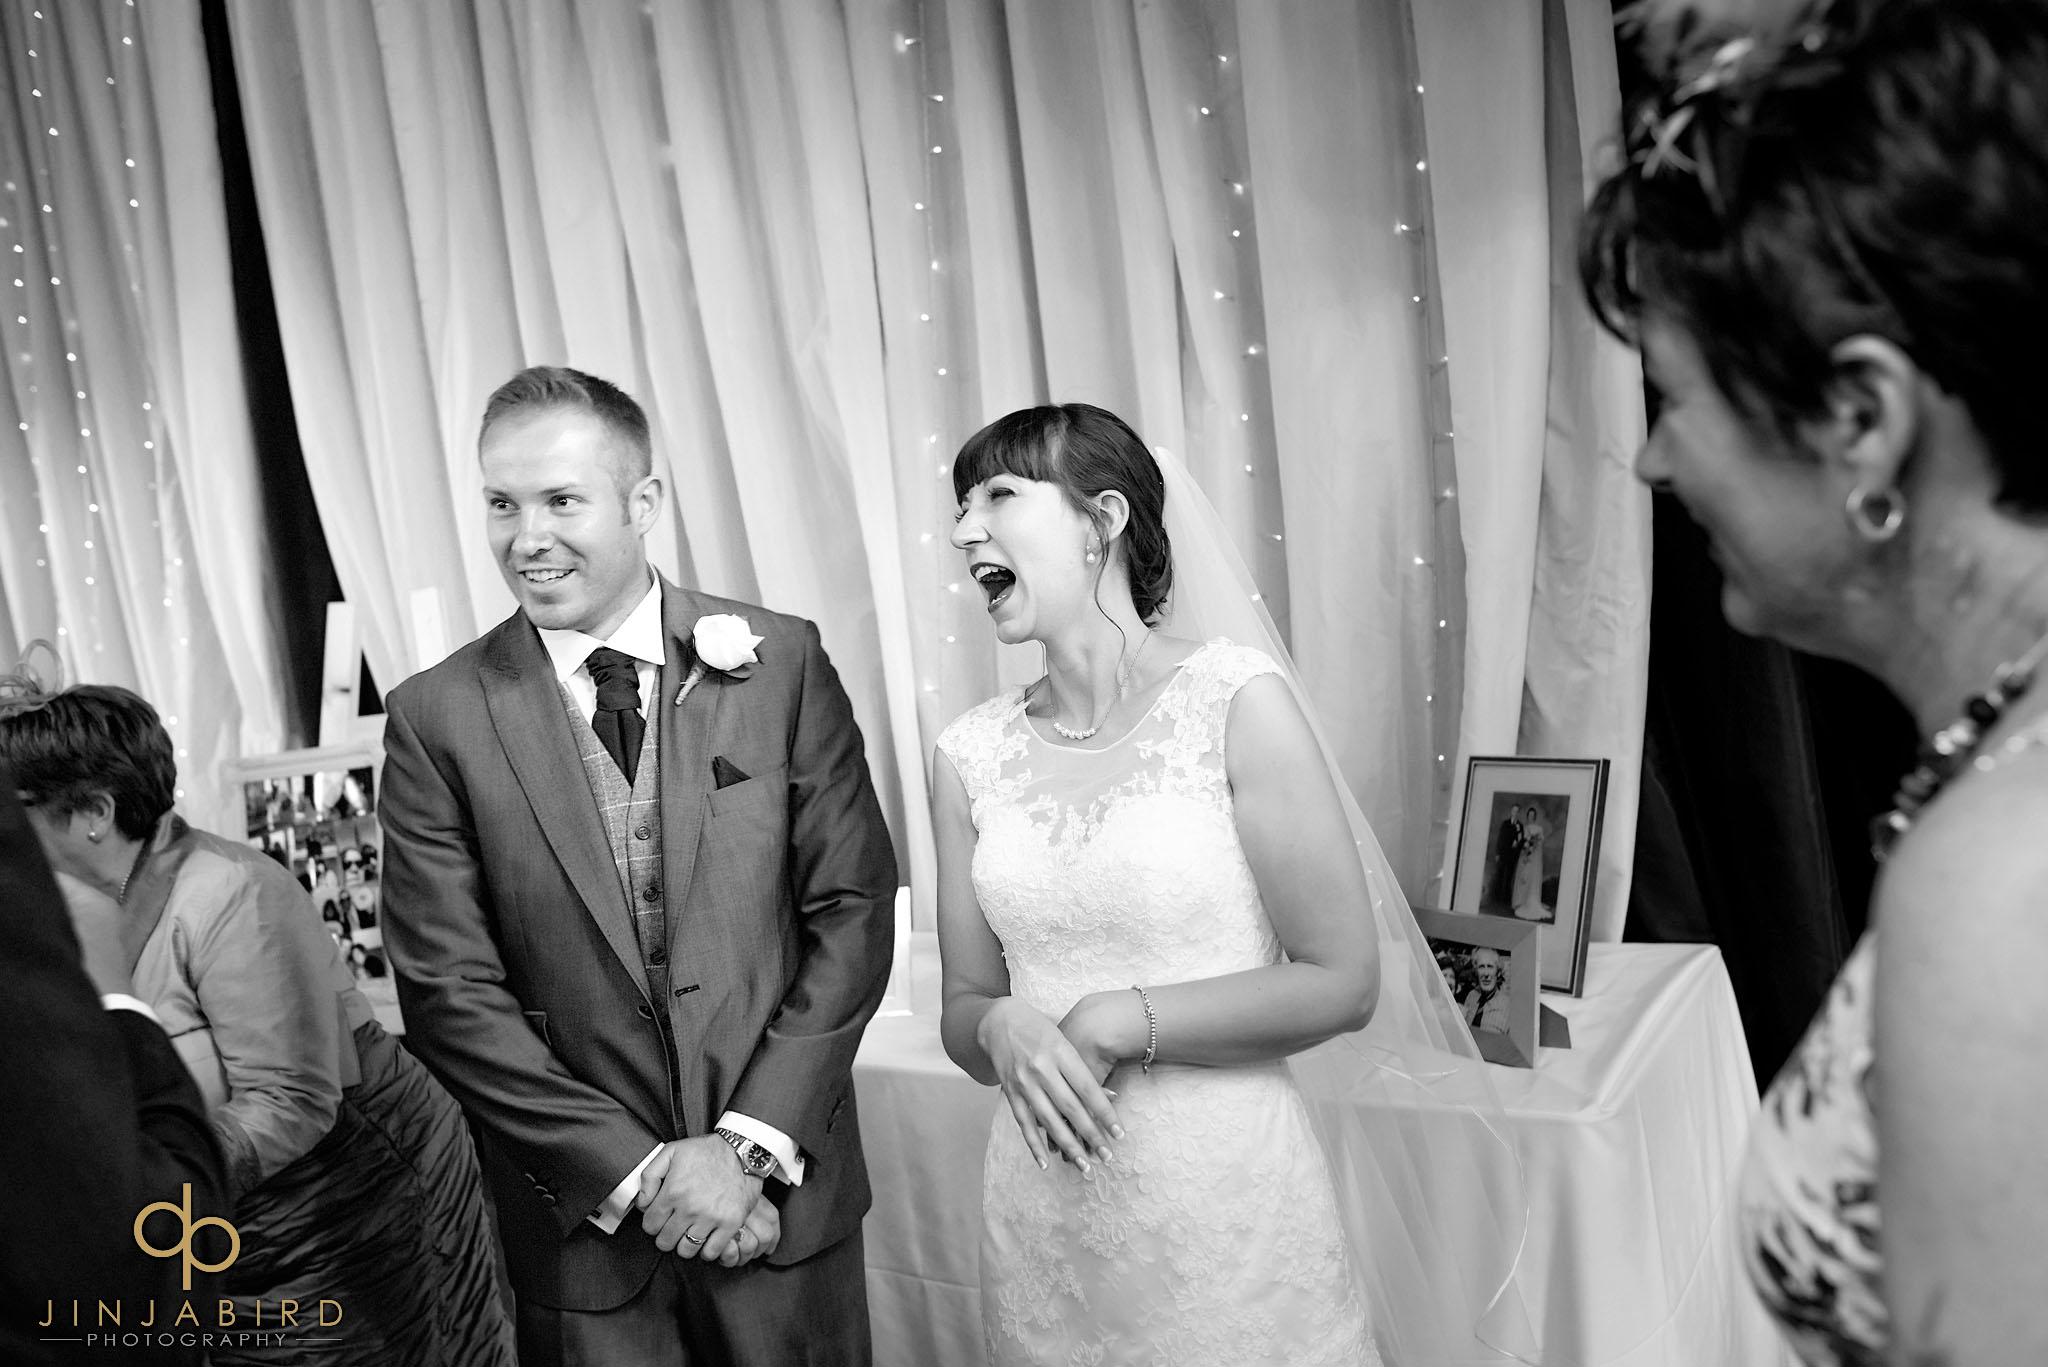 childerley hall wedding reception